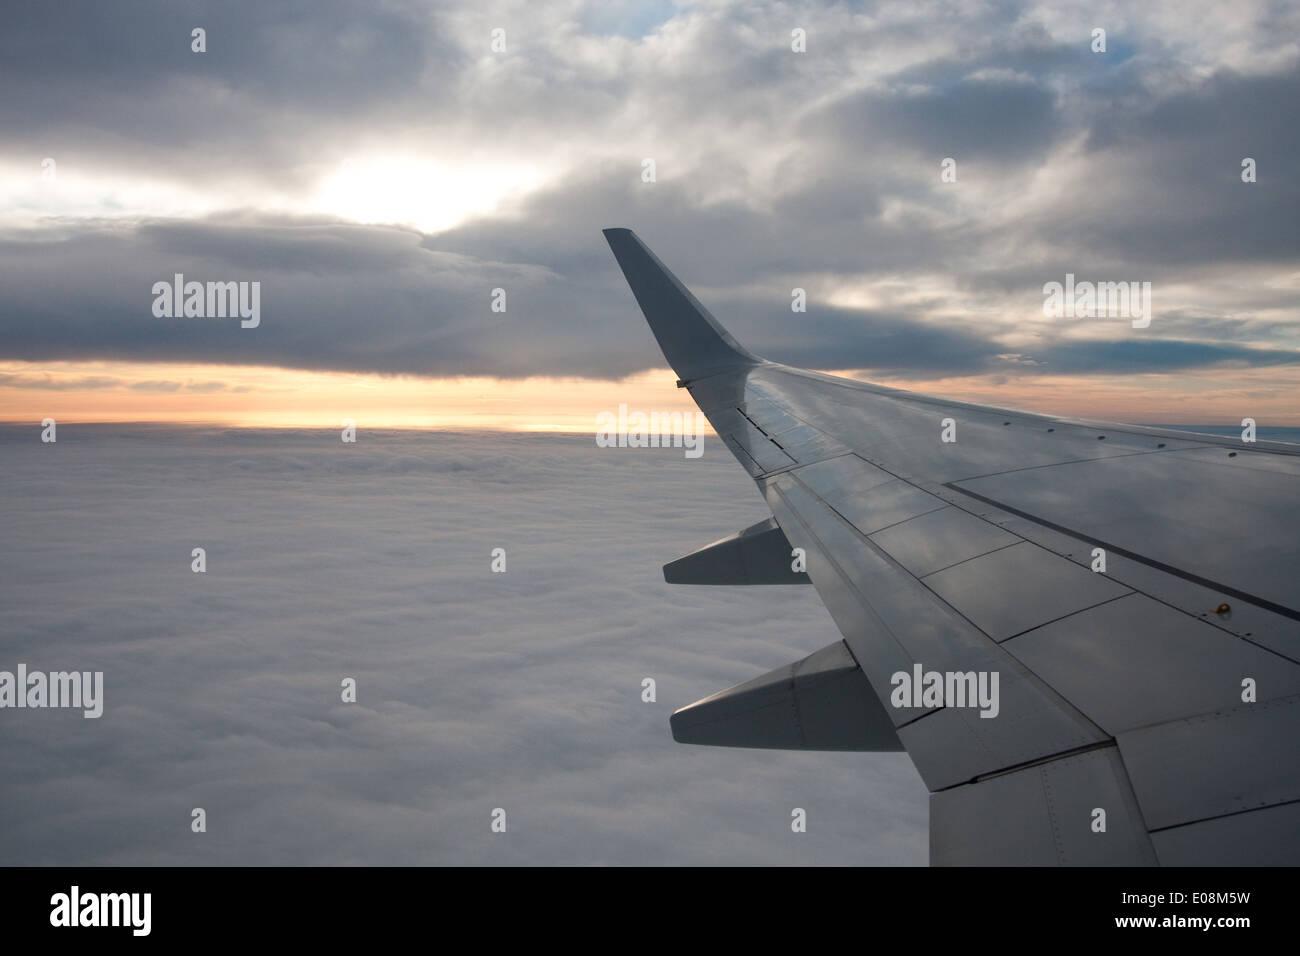 Wolkendecke, Flugzeugflügel - Clouds, Aeroplane wing Stock Photo